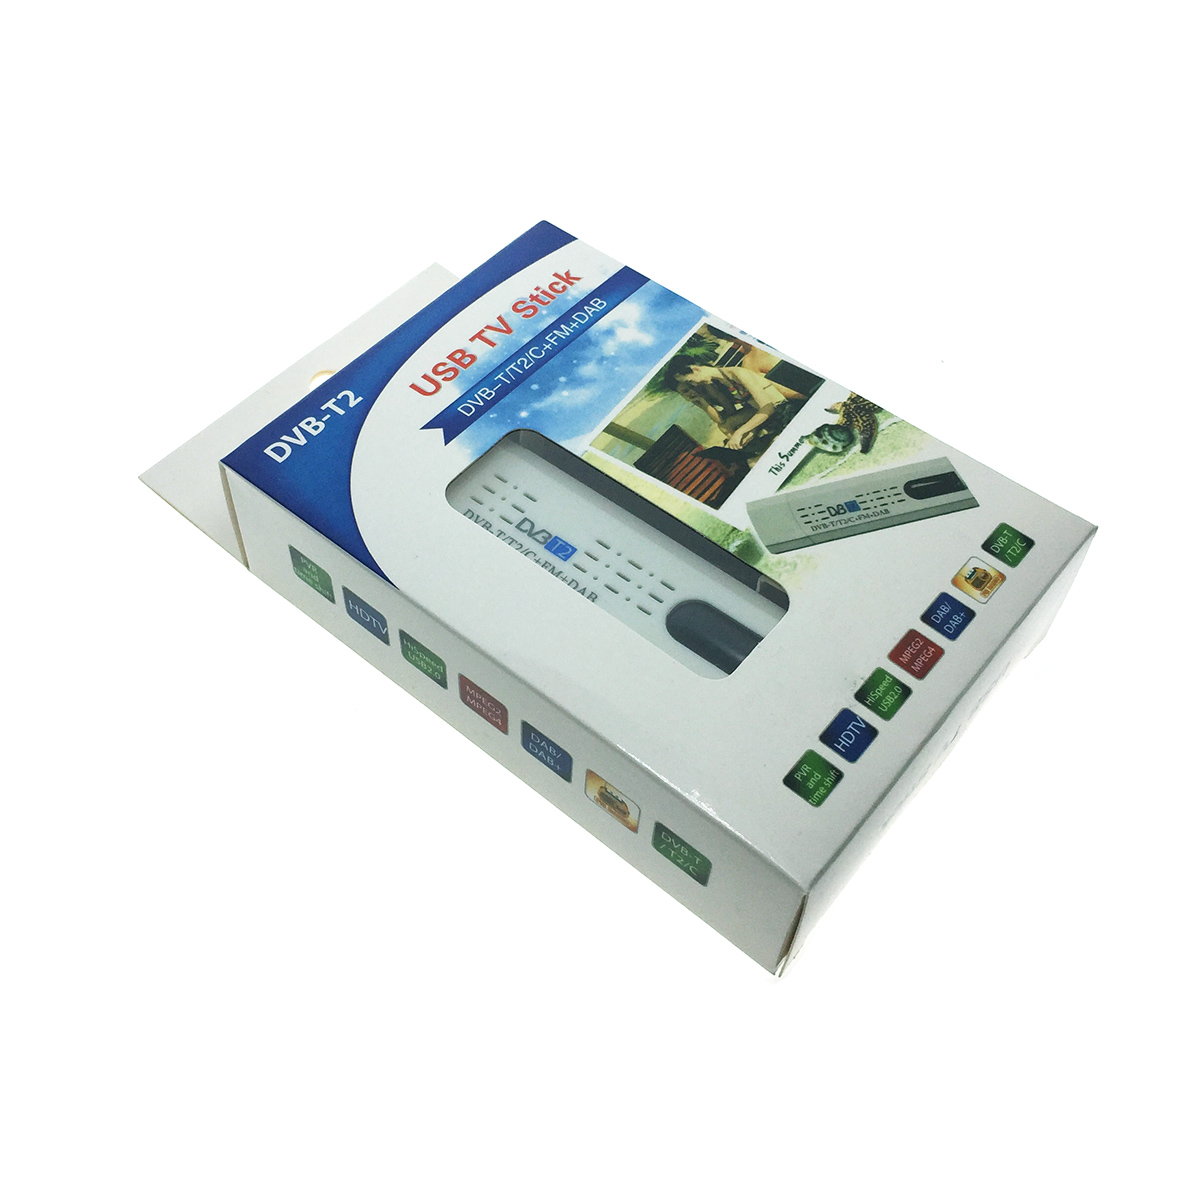 USB цифровой ТВ тюнер dvb t2, Espada ESP-DVBT2